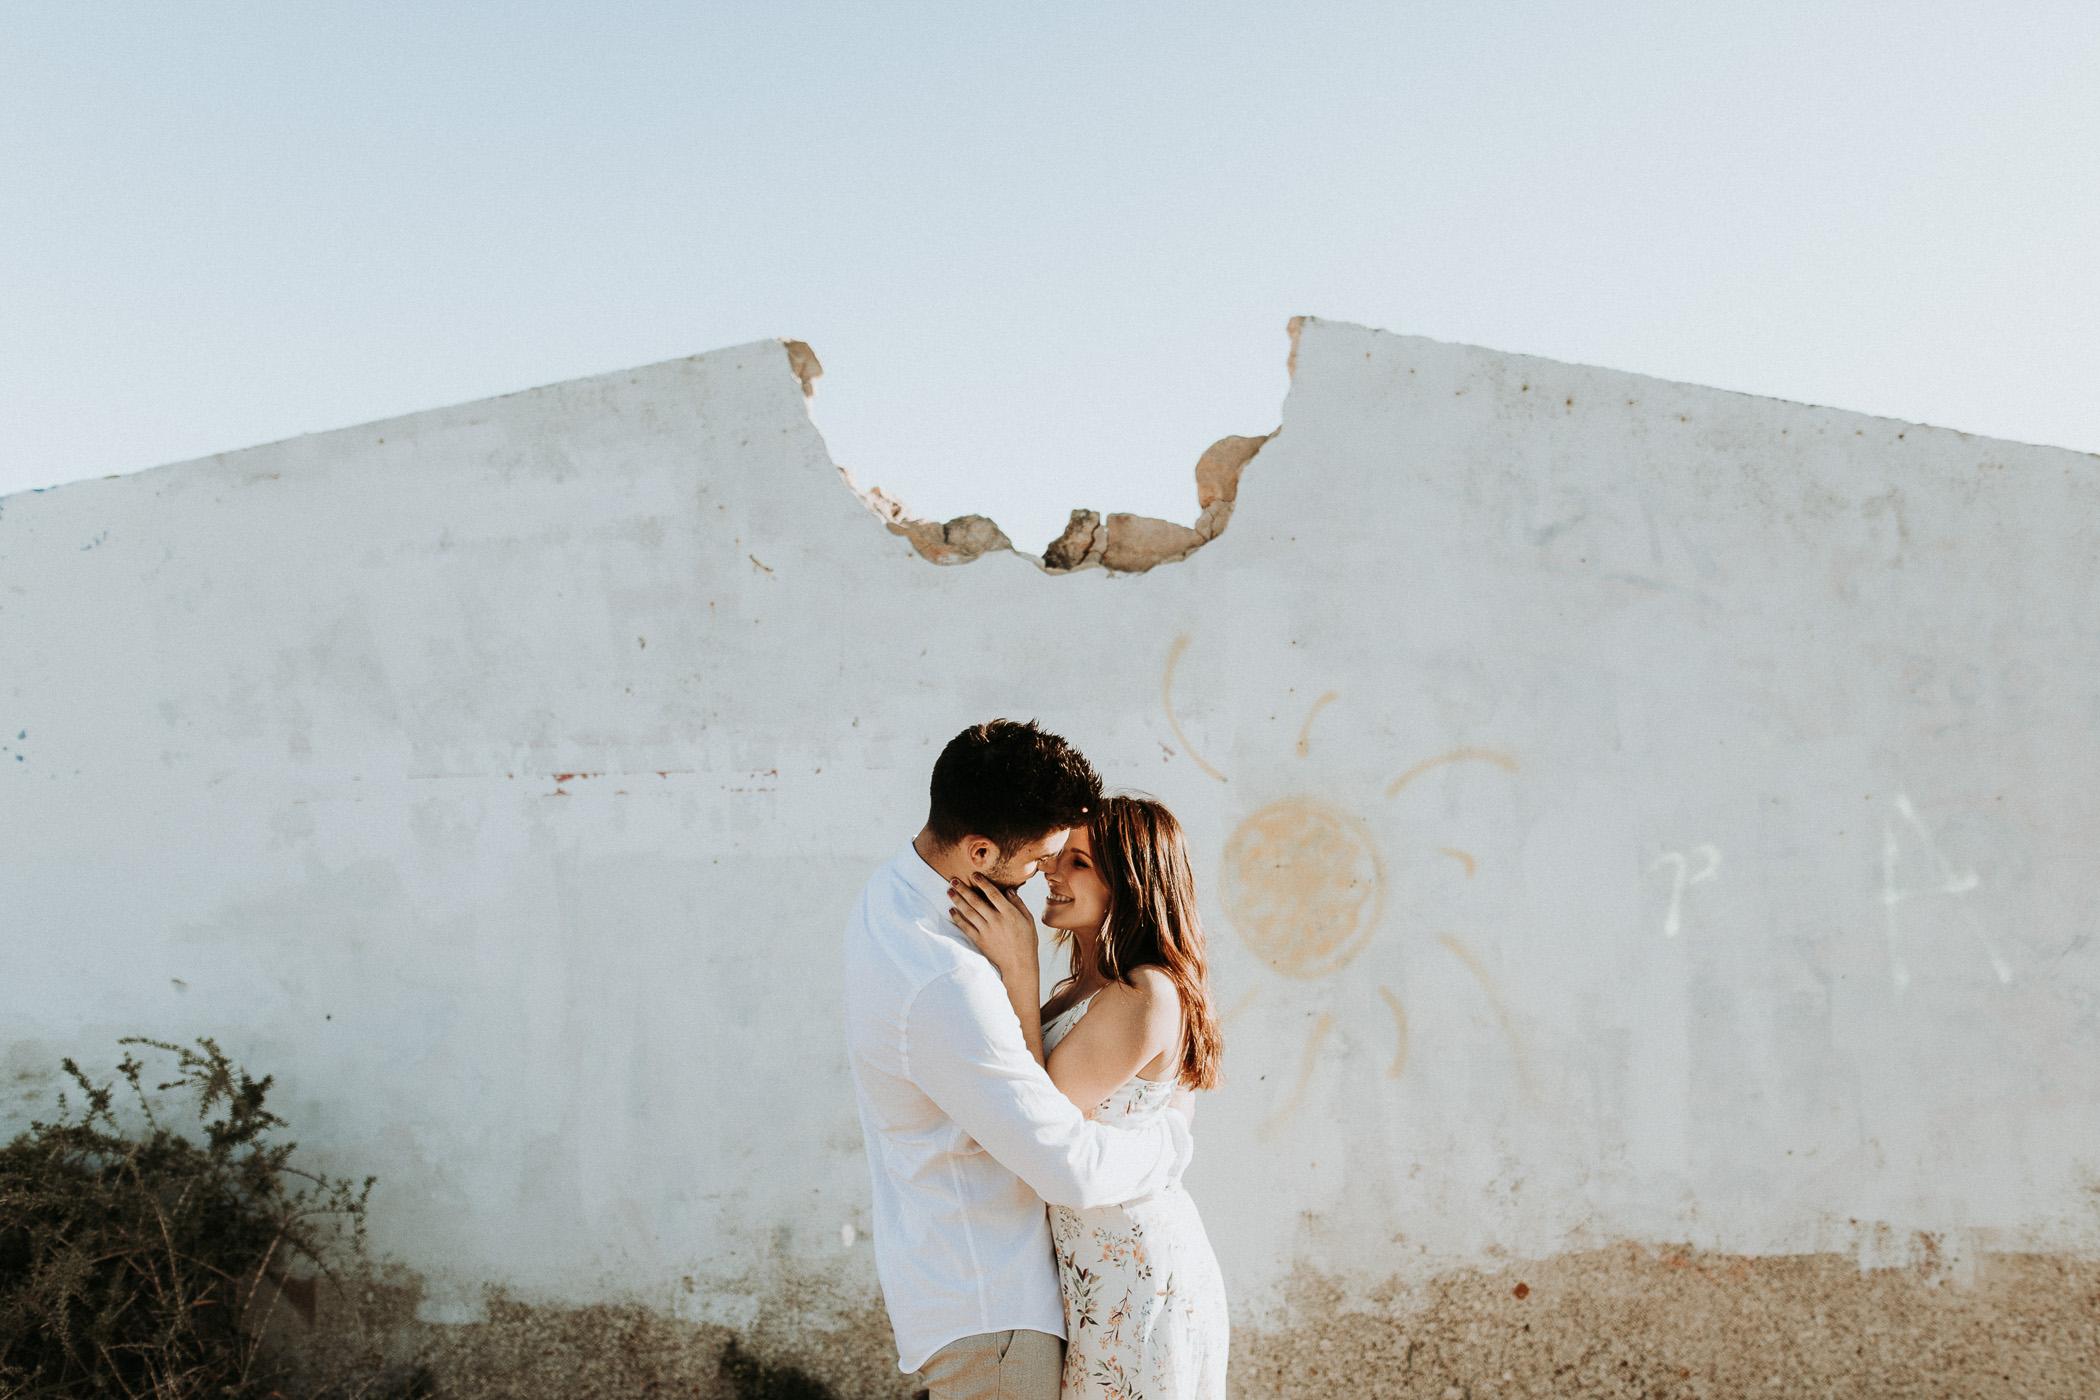 DanielaMarquardtPhotography_wedding_elopement_mallorca_spain_calapi_palma_lauraandtoni_354